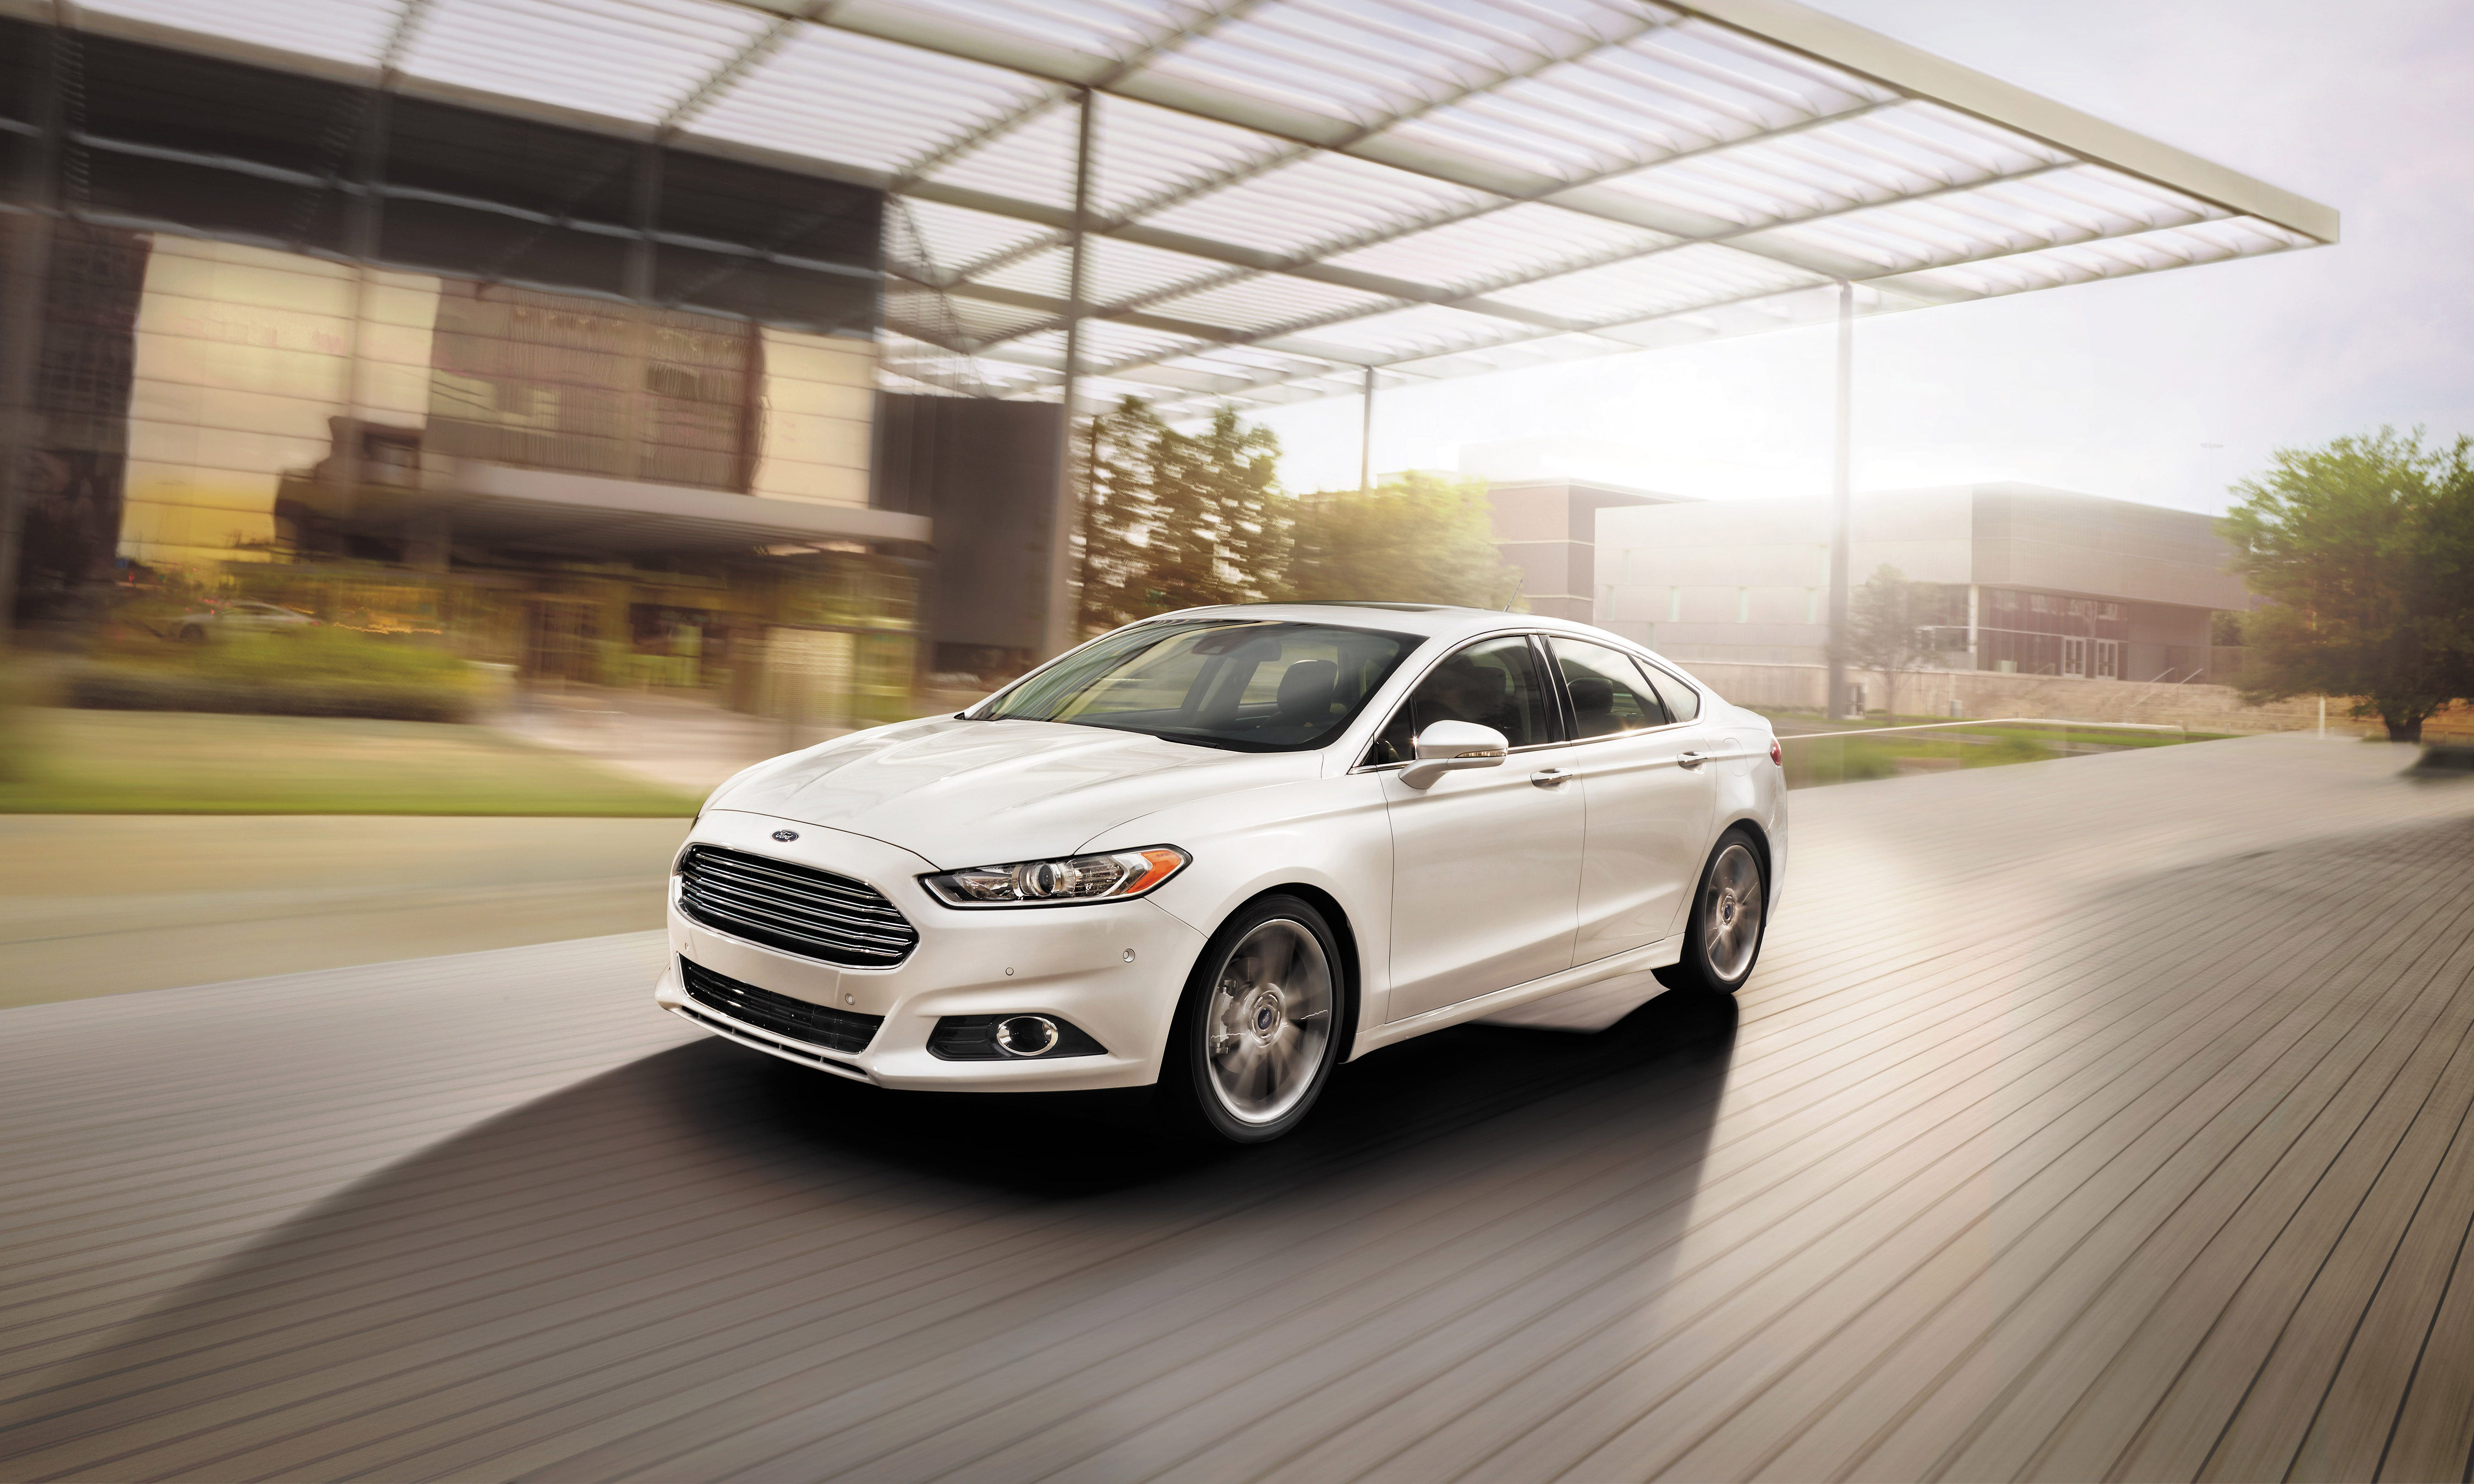 14FUSI_Cover_mj & Ford to be 2013u0027s best-selling car brand in U.S. markmcfarlin.com